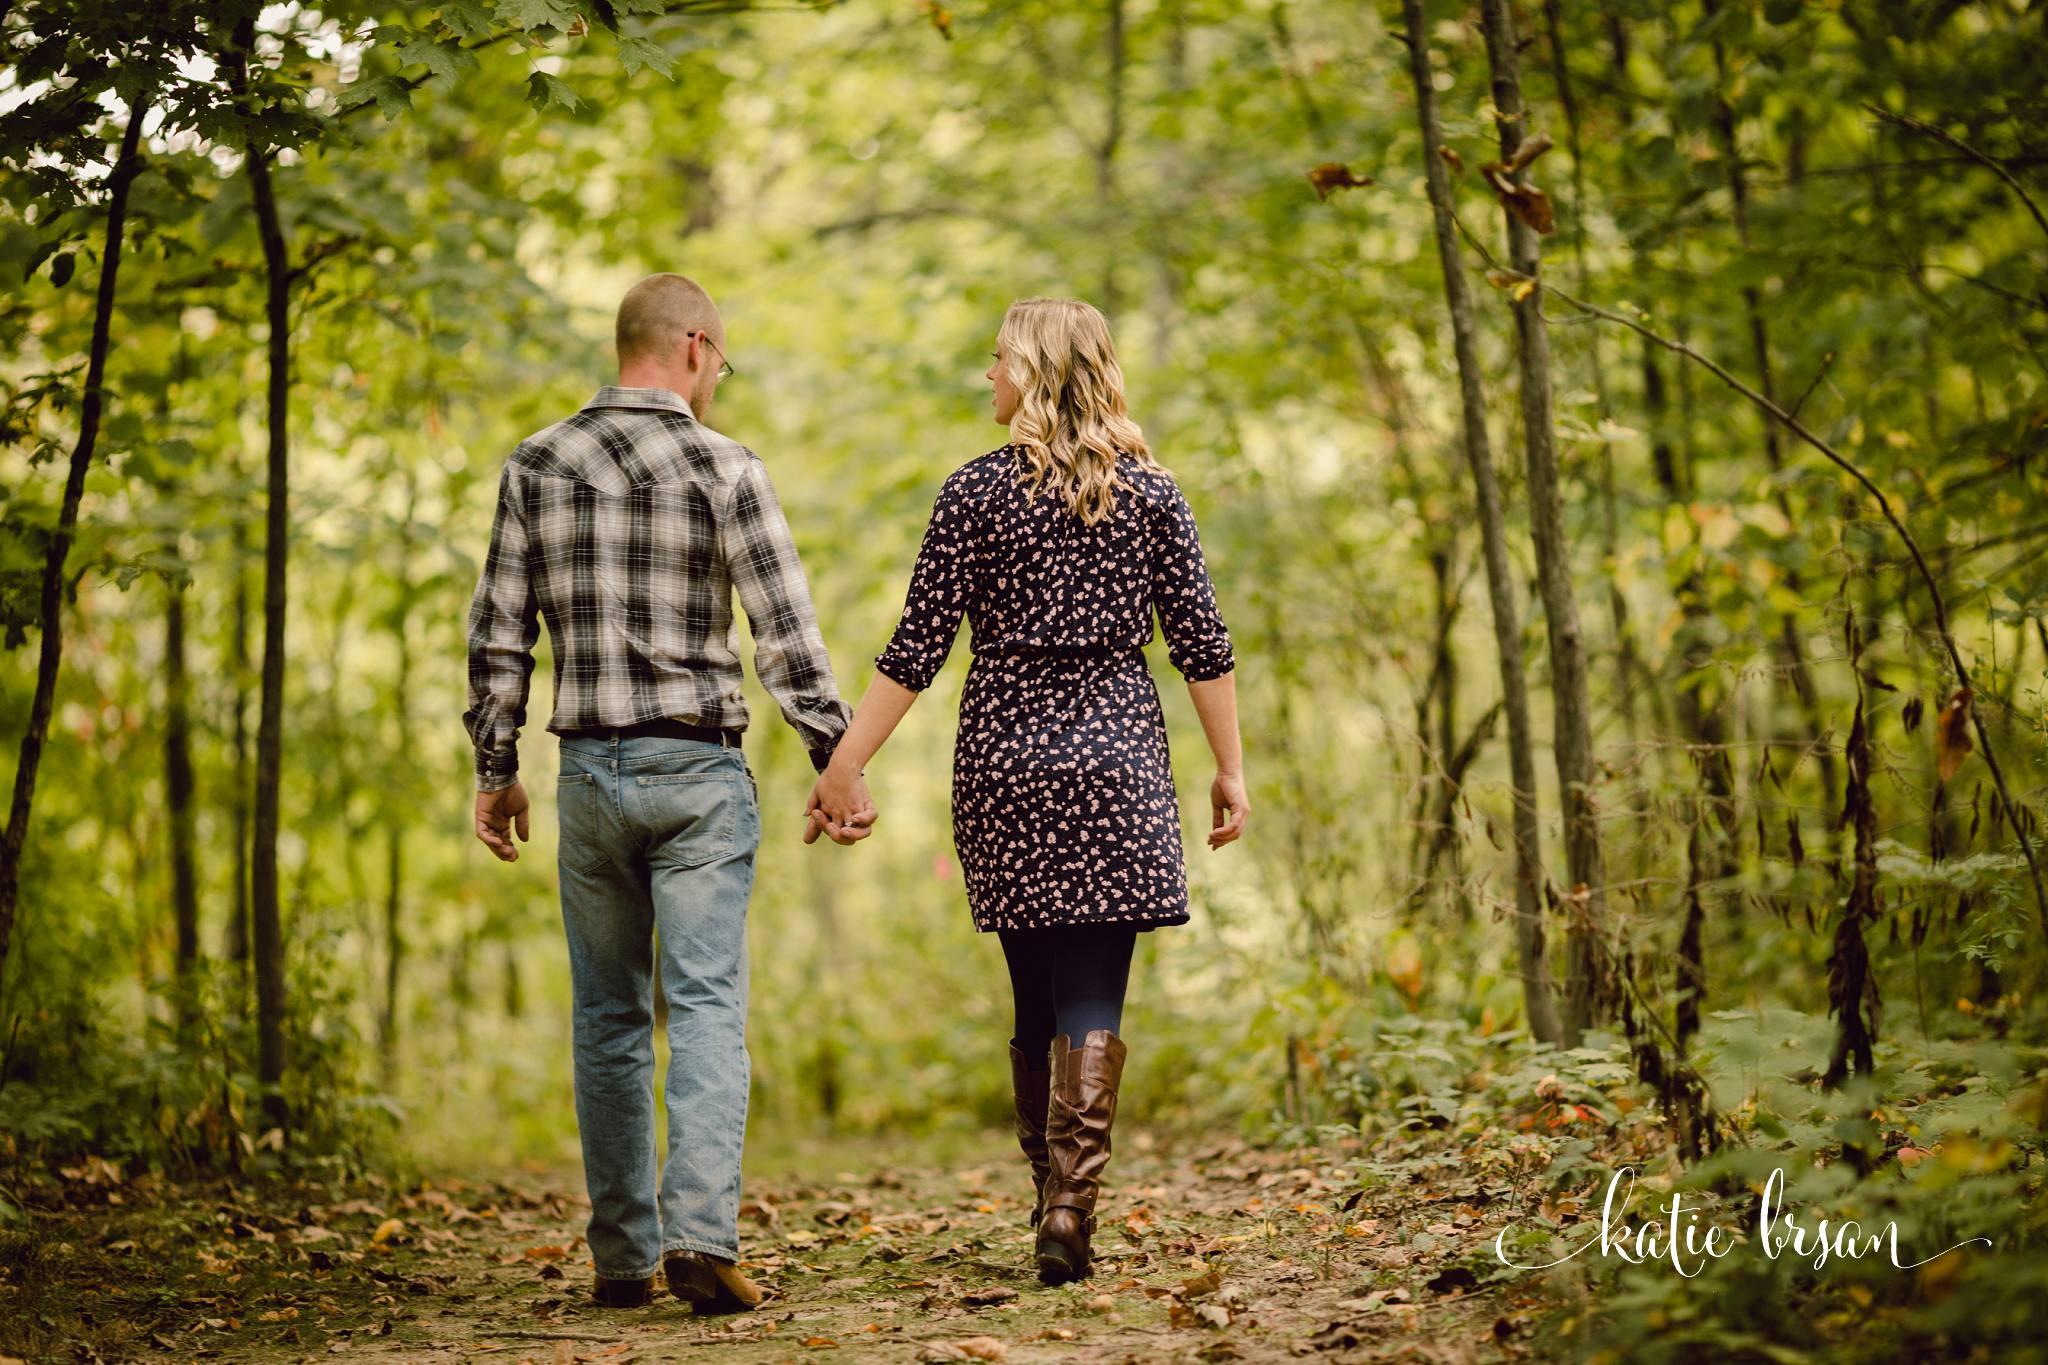 KatieBrsan-Frankfort-EngagementPhotos_0498.jpg